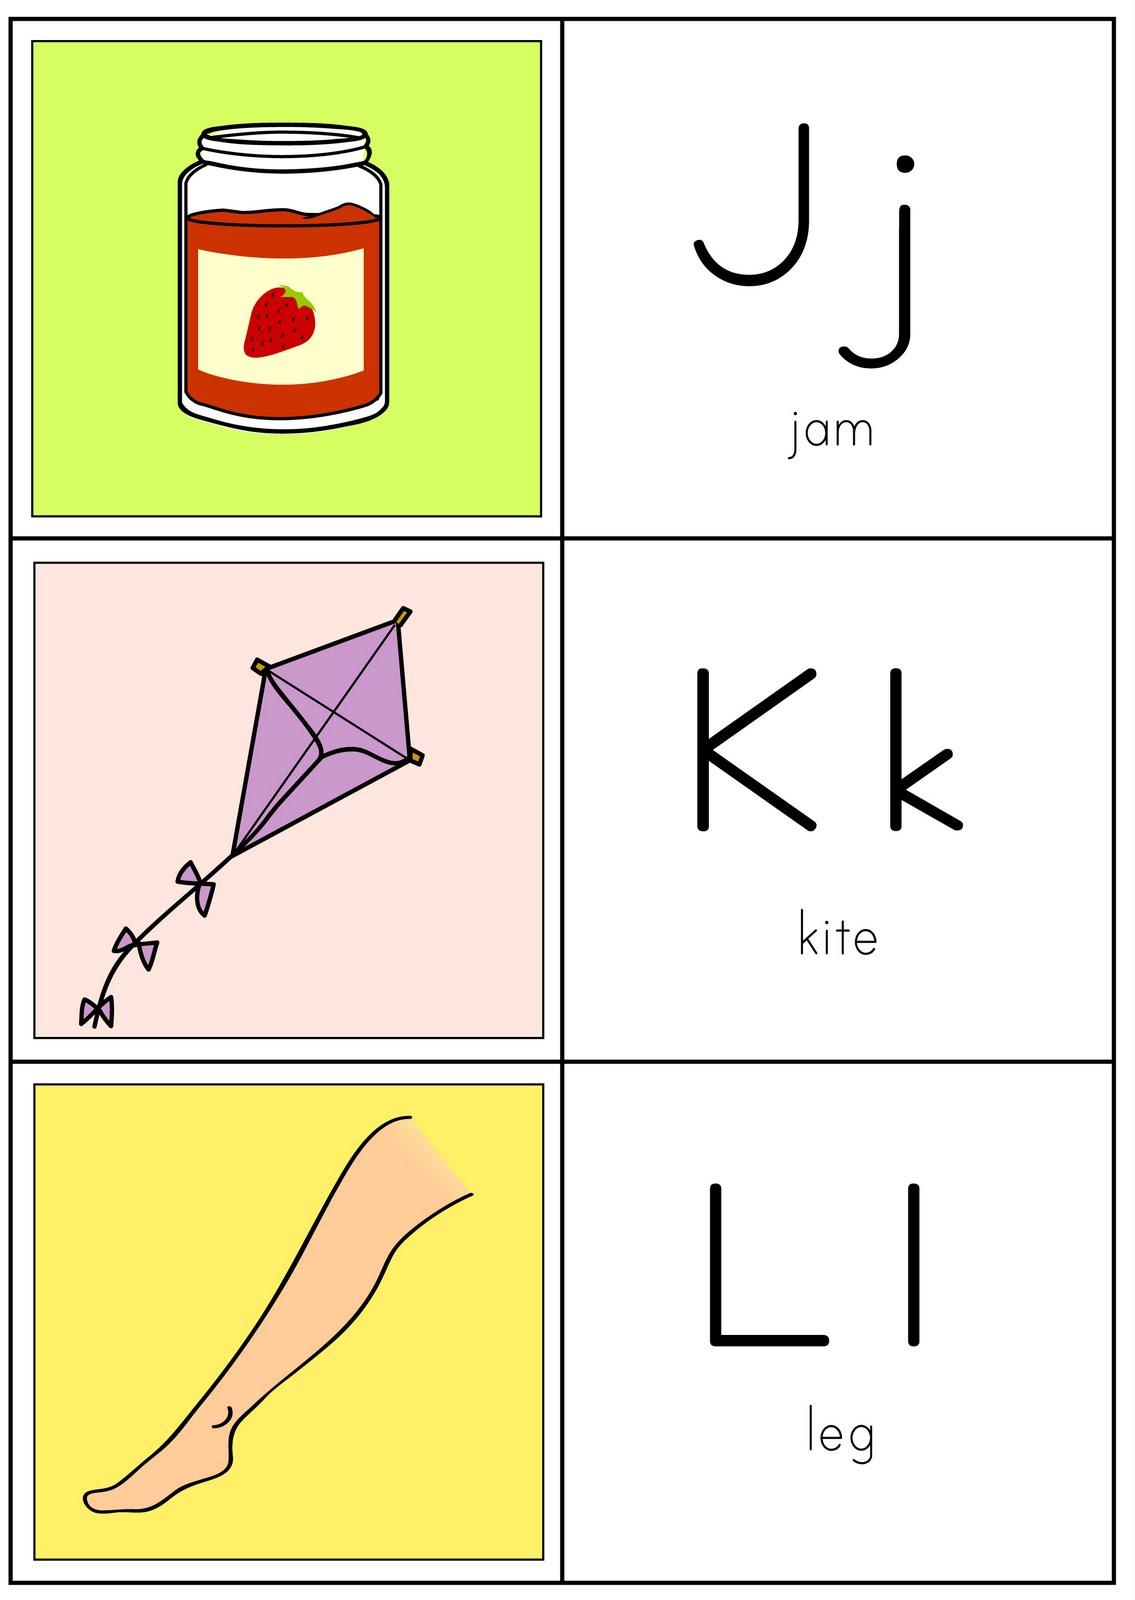 Coisas De Pr S Alfabeto Ilustrado Em Ingl S -> Desenhos Para Alfabeto Ilustrado